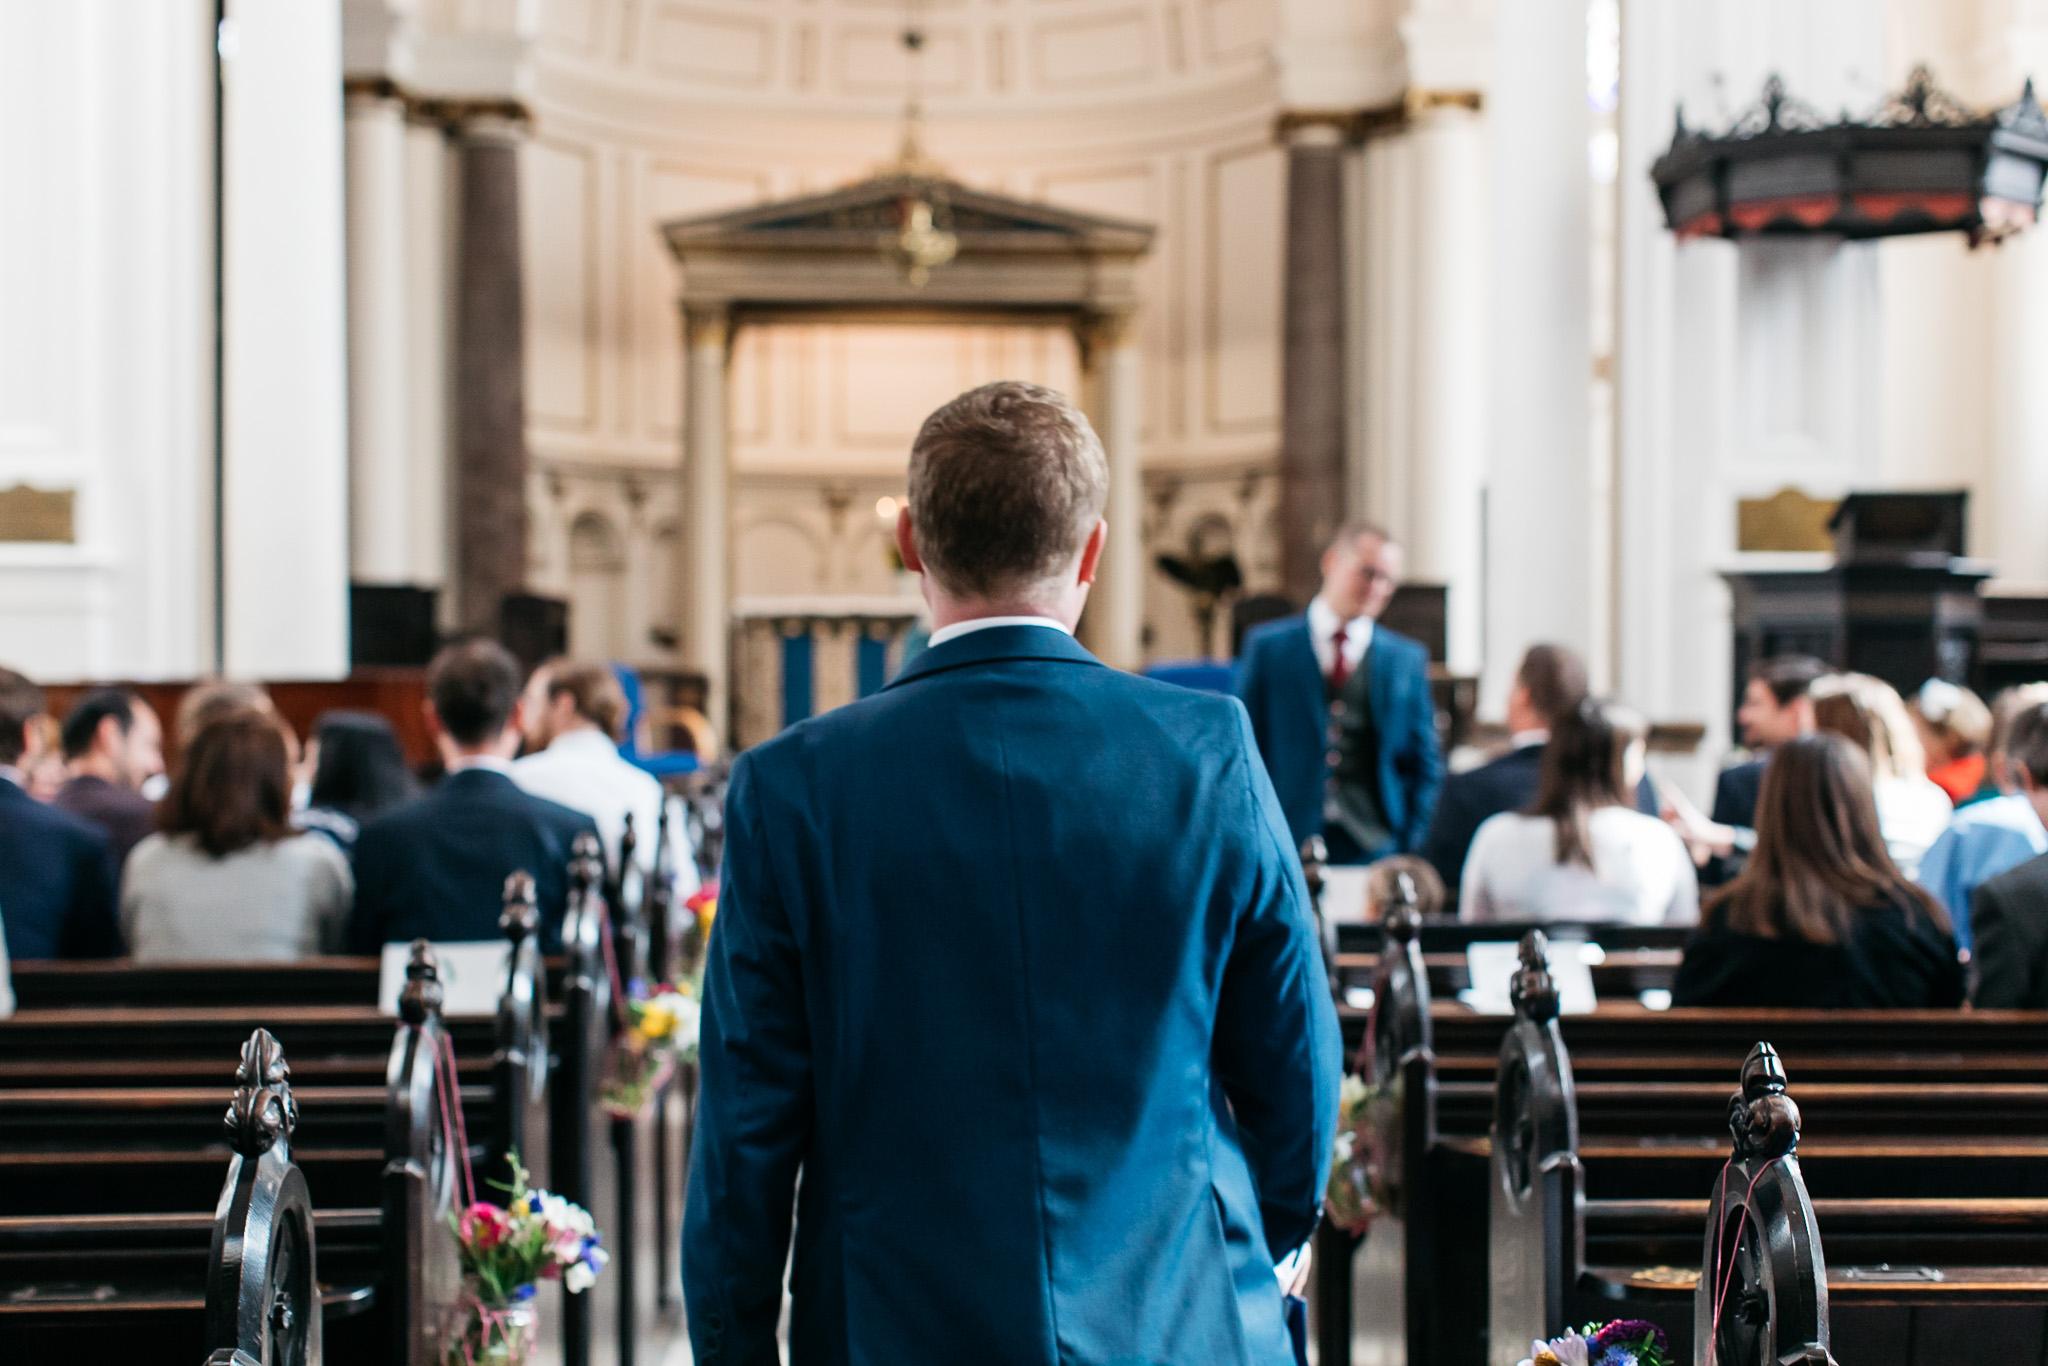 st_andrews_fabrica_brighton_wedding_542.jpg